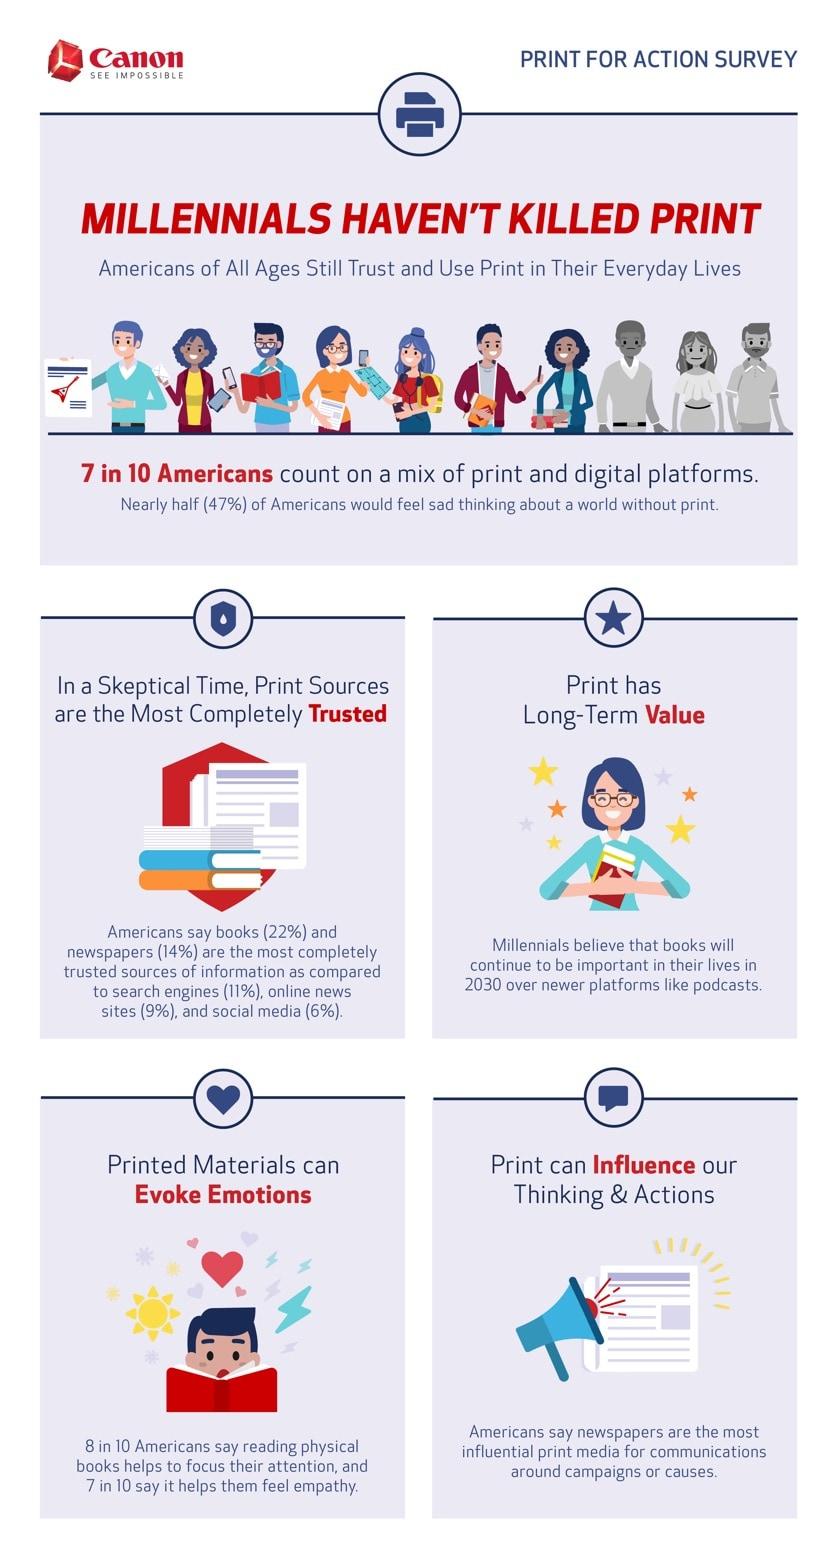 Millennials still love print - full infographic